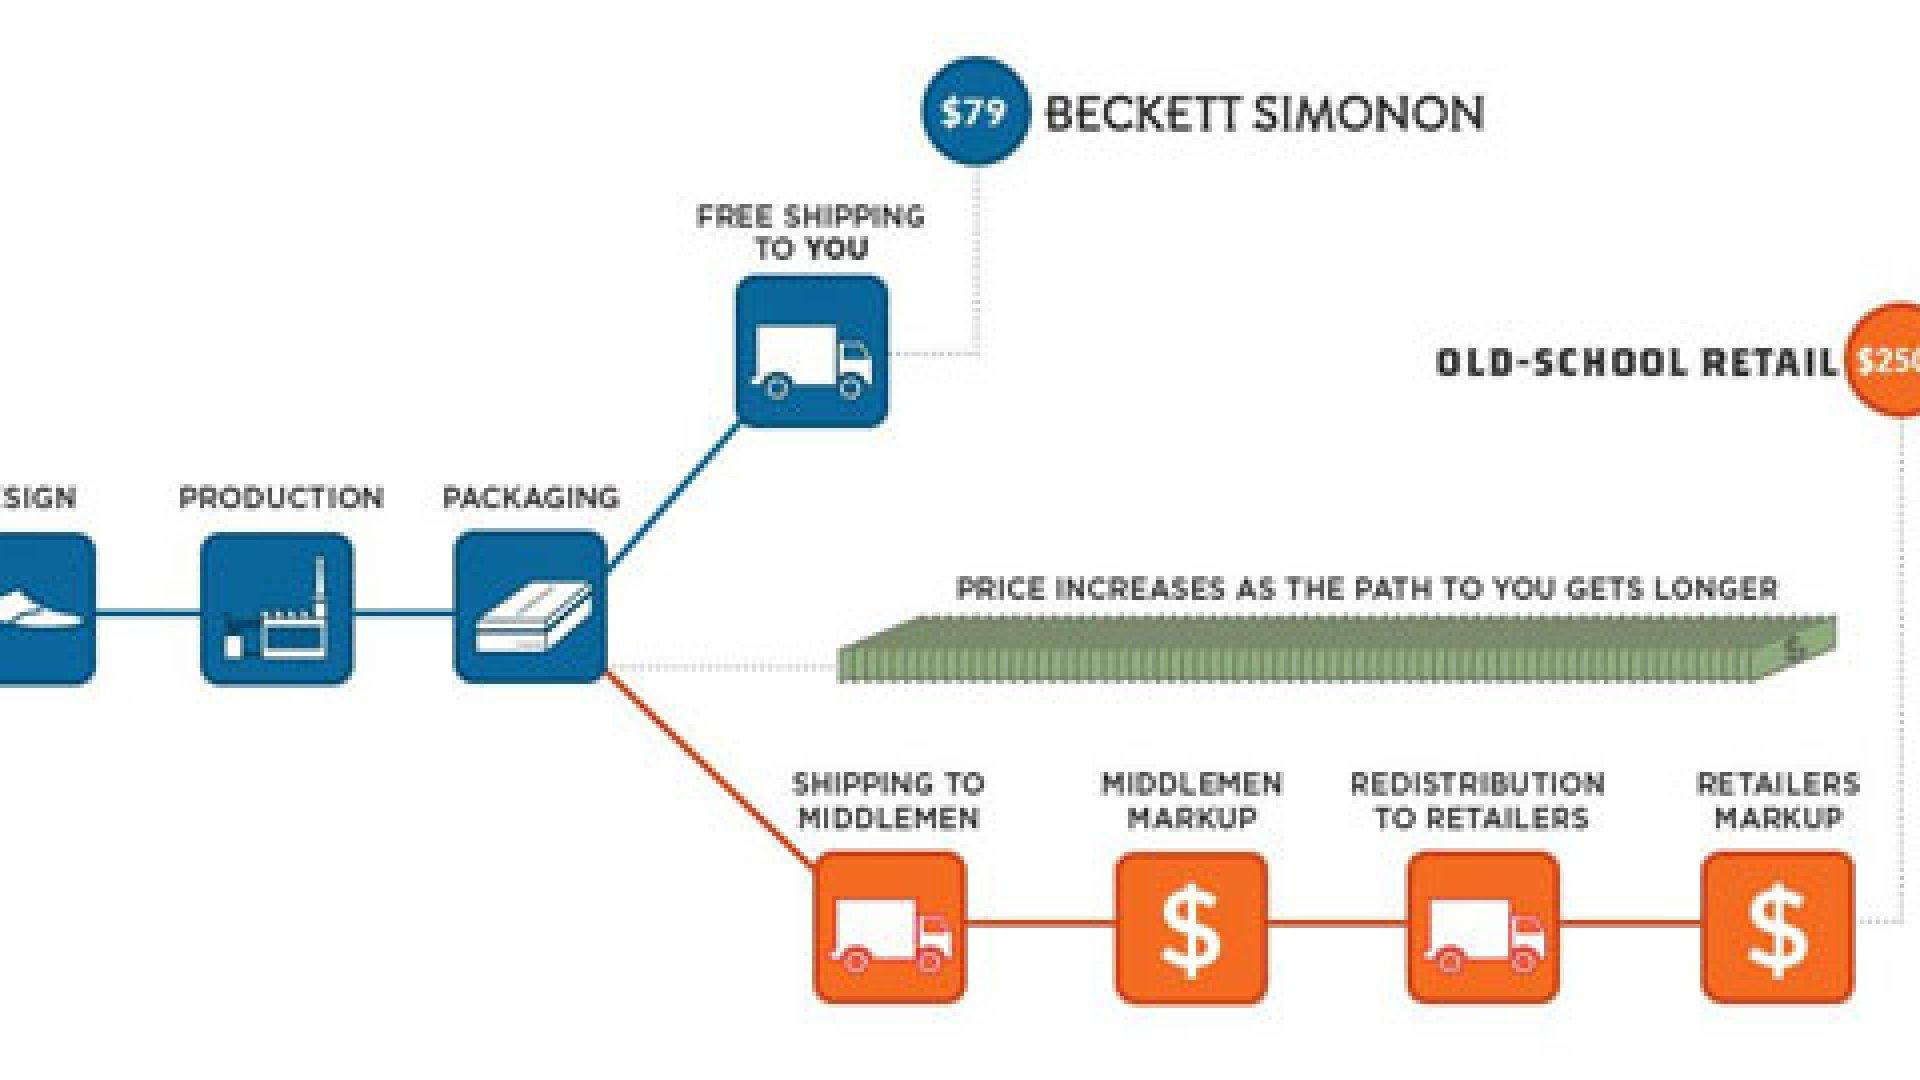 Warby Parker of Shoes? Meet Beckett Simonon